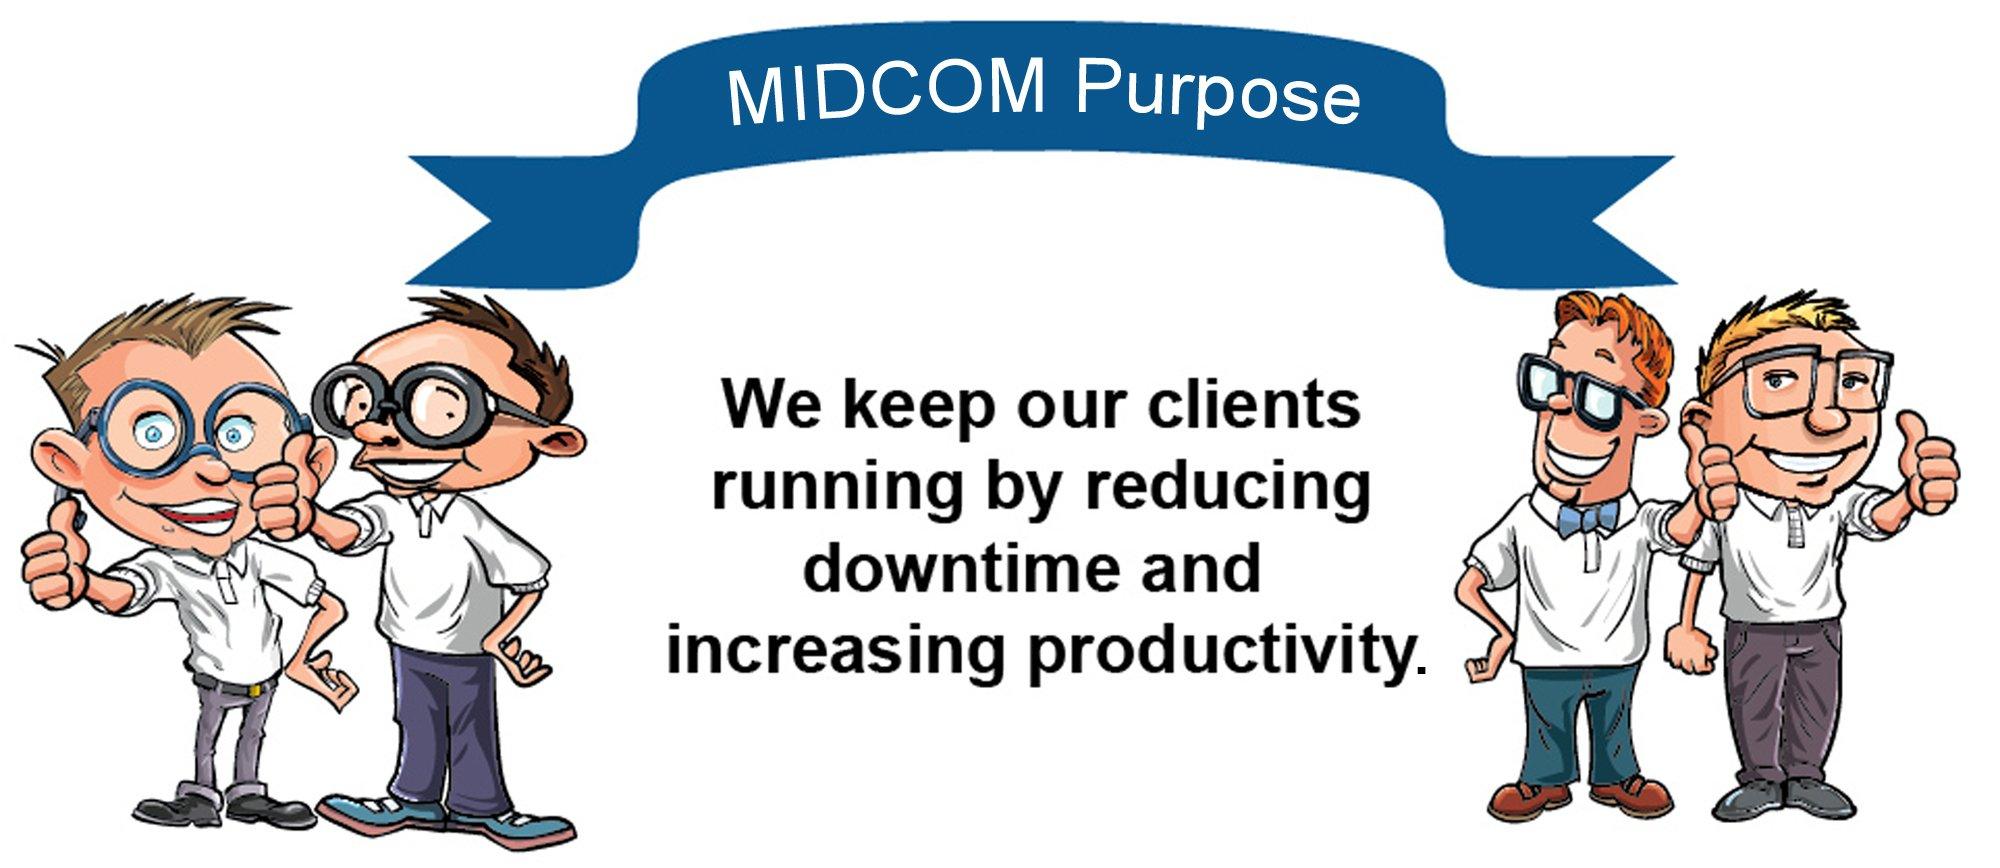 MIDCOM Purpose